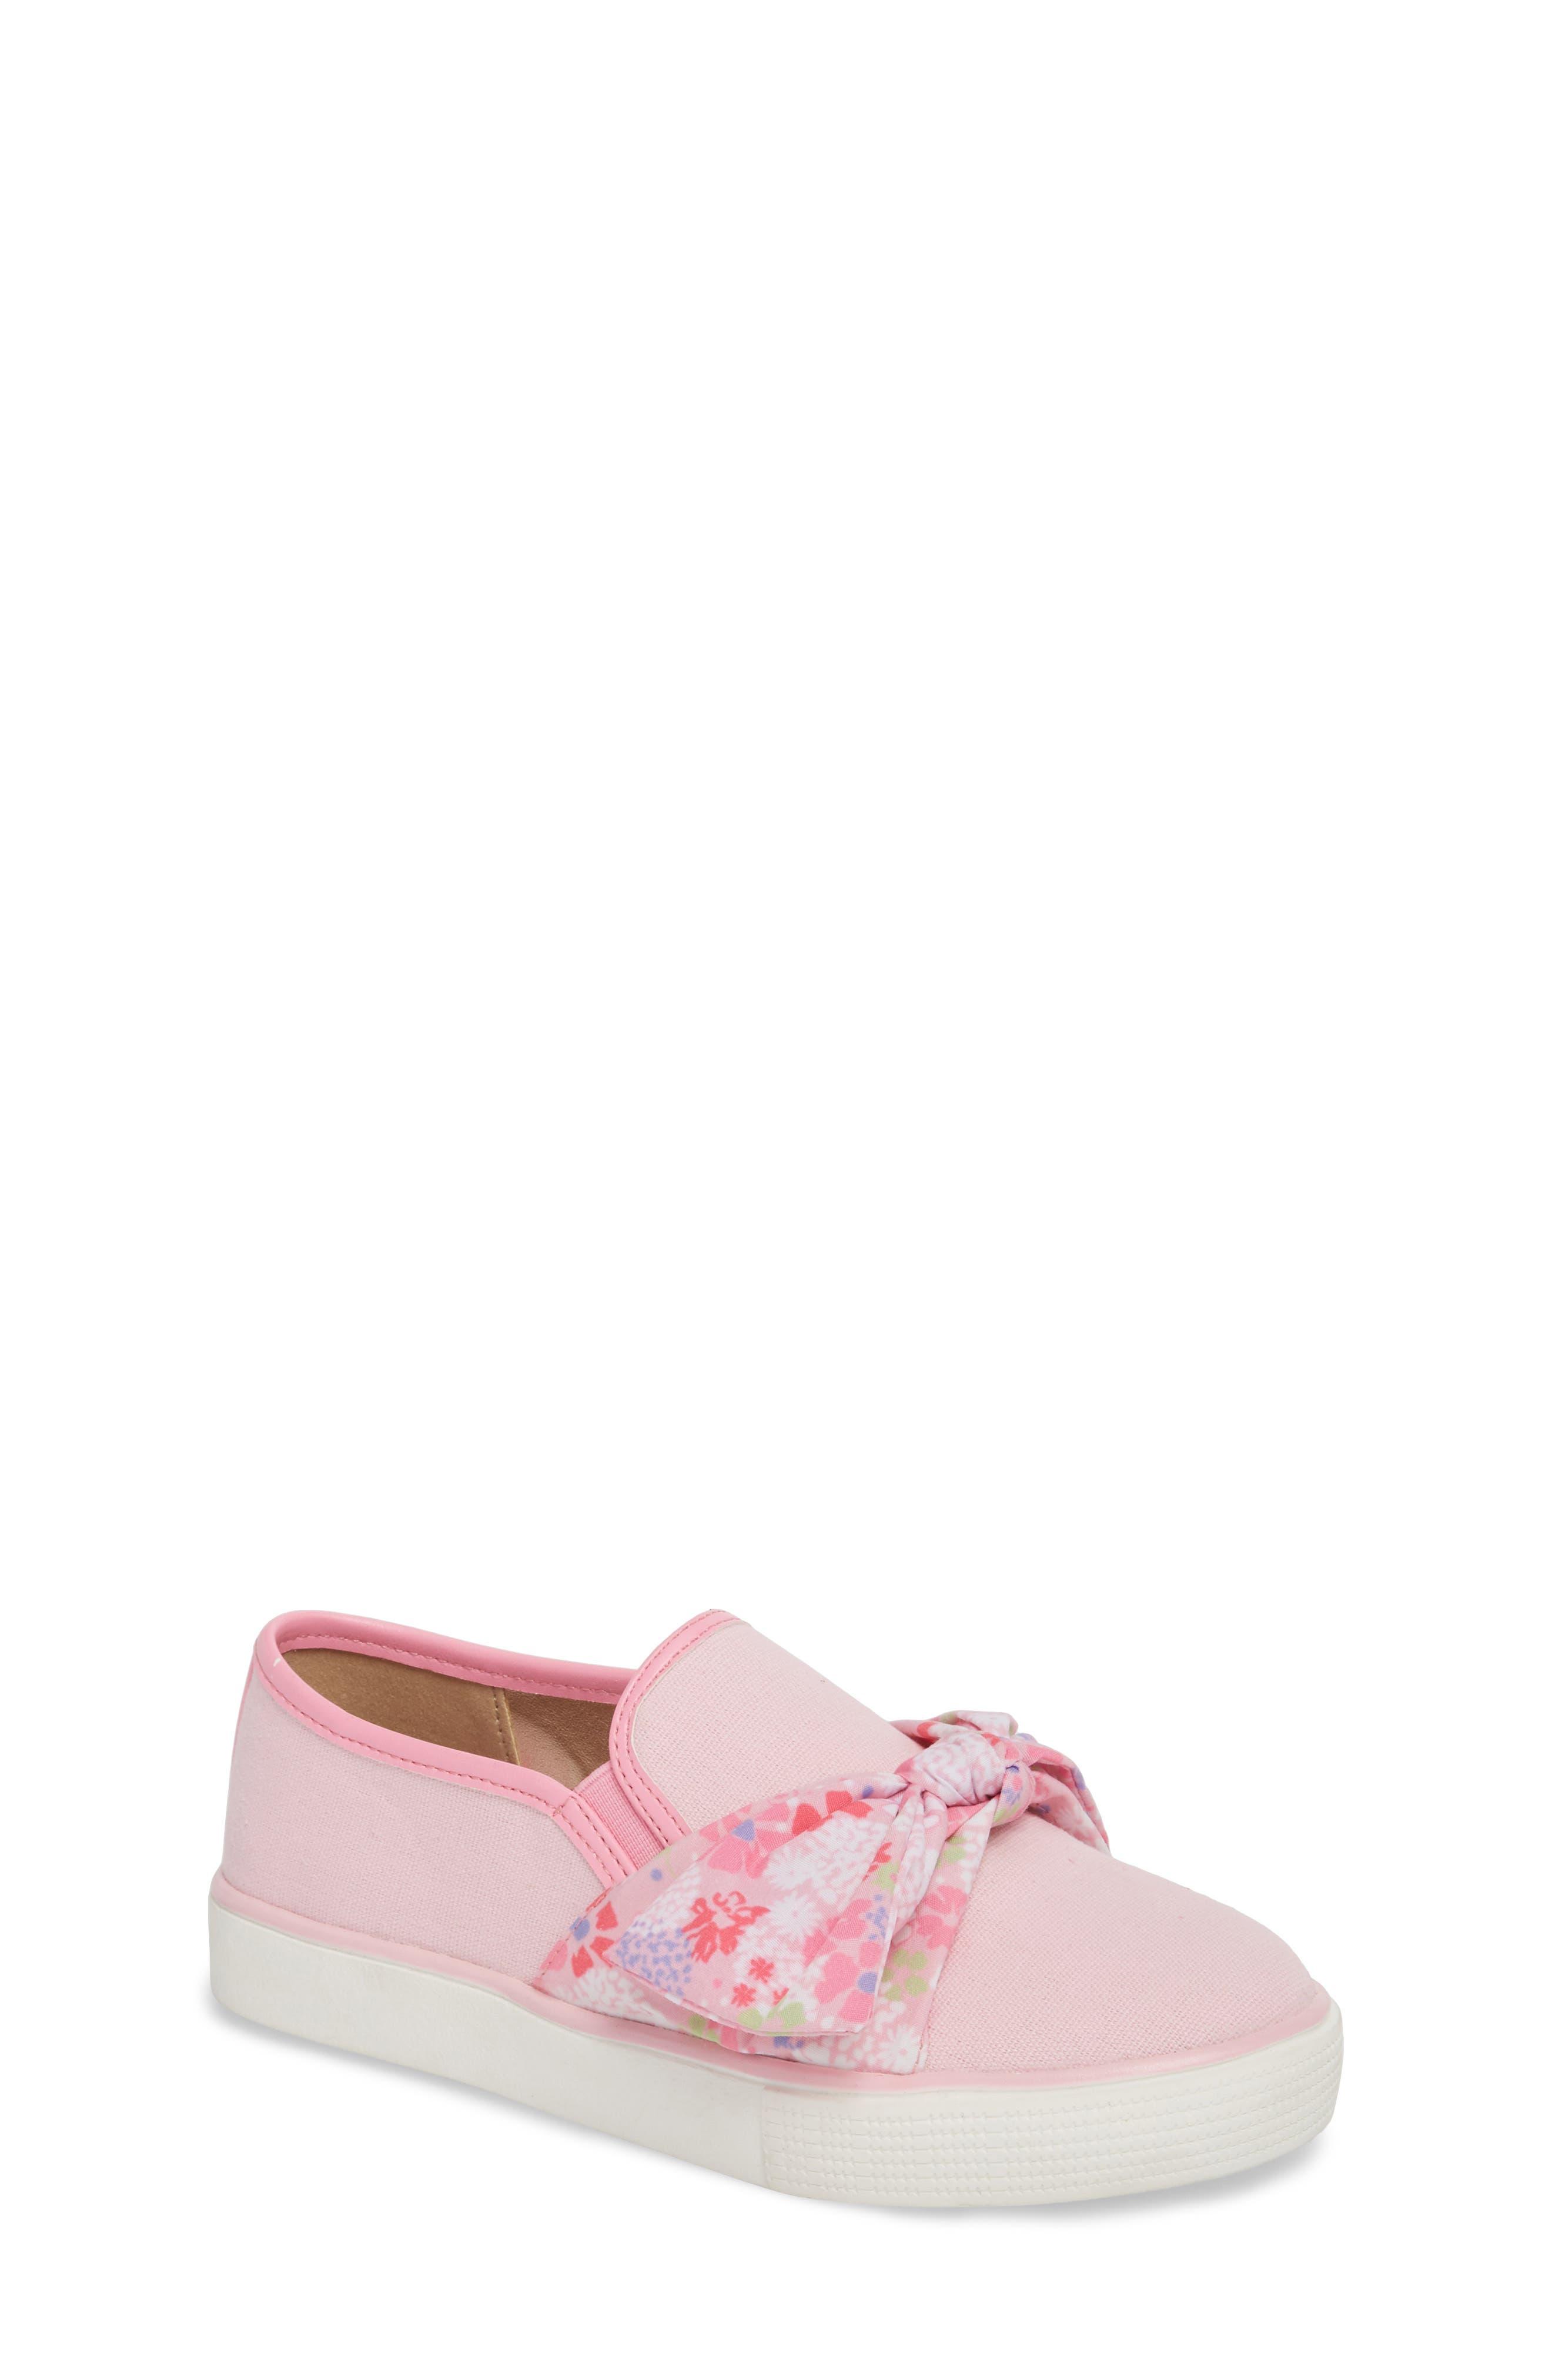 Ashlyn Bow Slip-On Sneaker,                         Main,                         color, 652